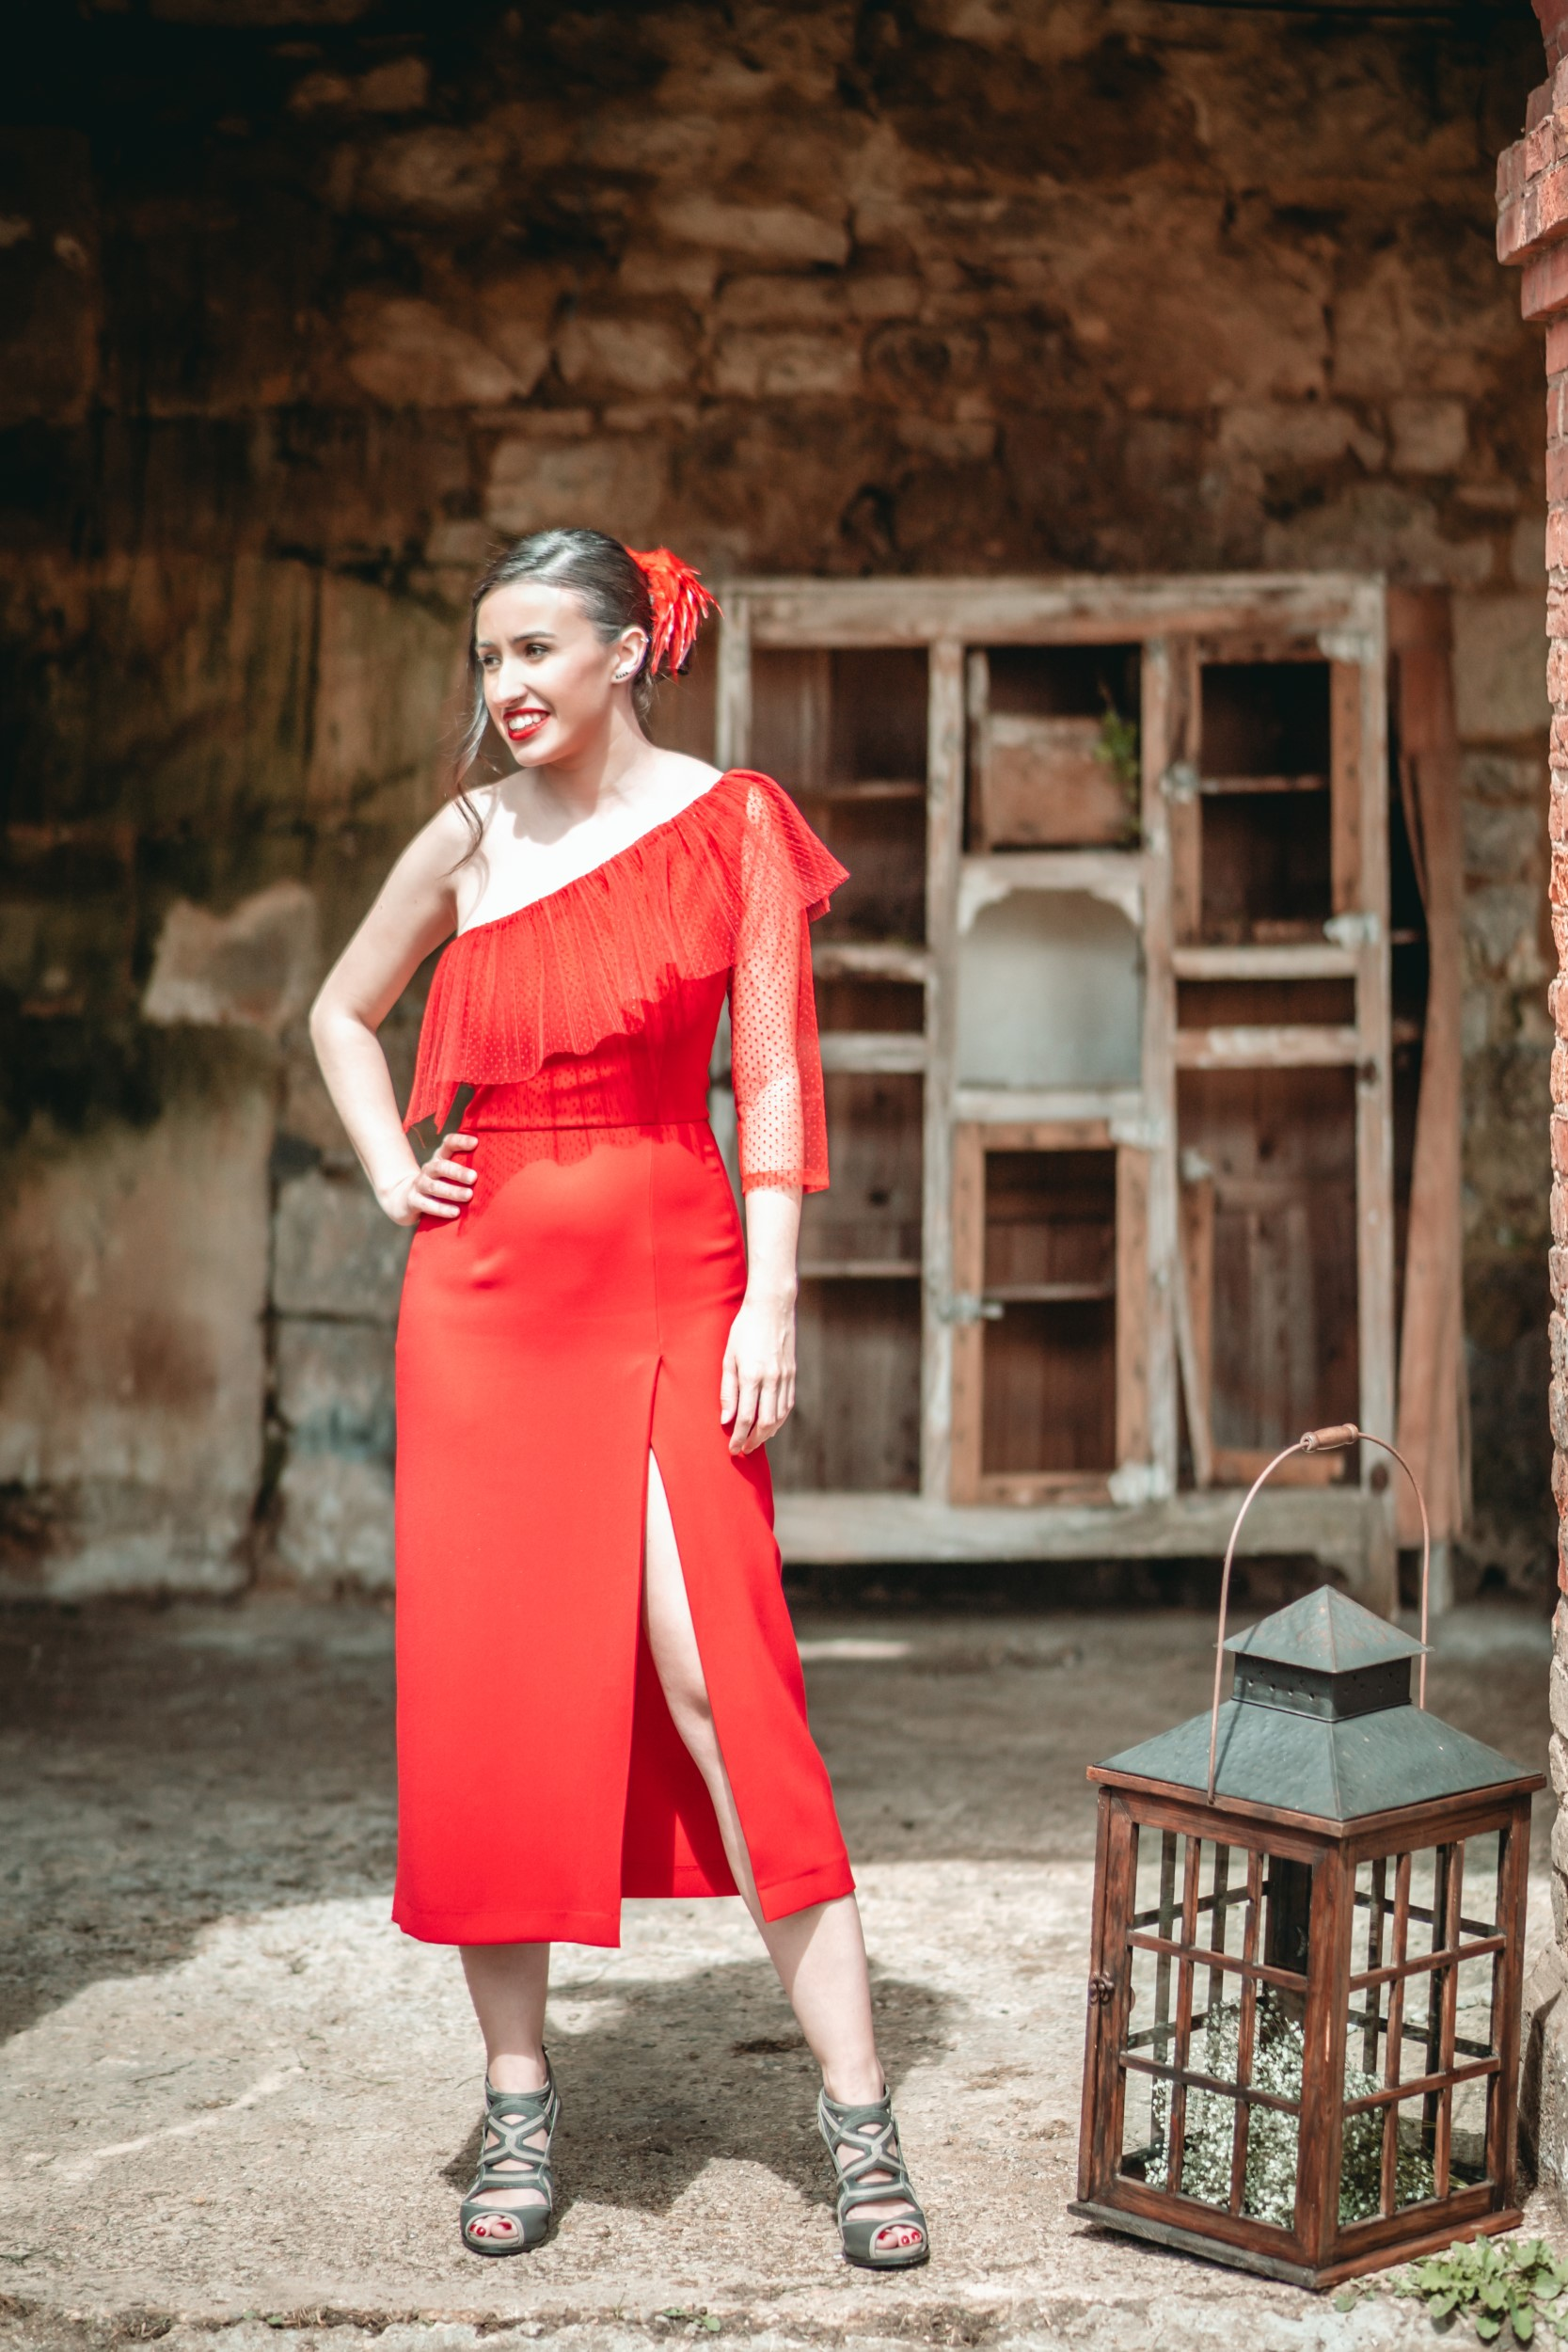 Ephemeral Al Detalle Wedding Planner Asturias - editorial vestidos apparentia - 9538